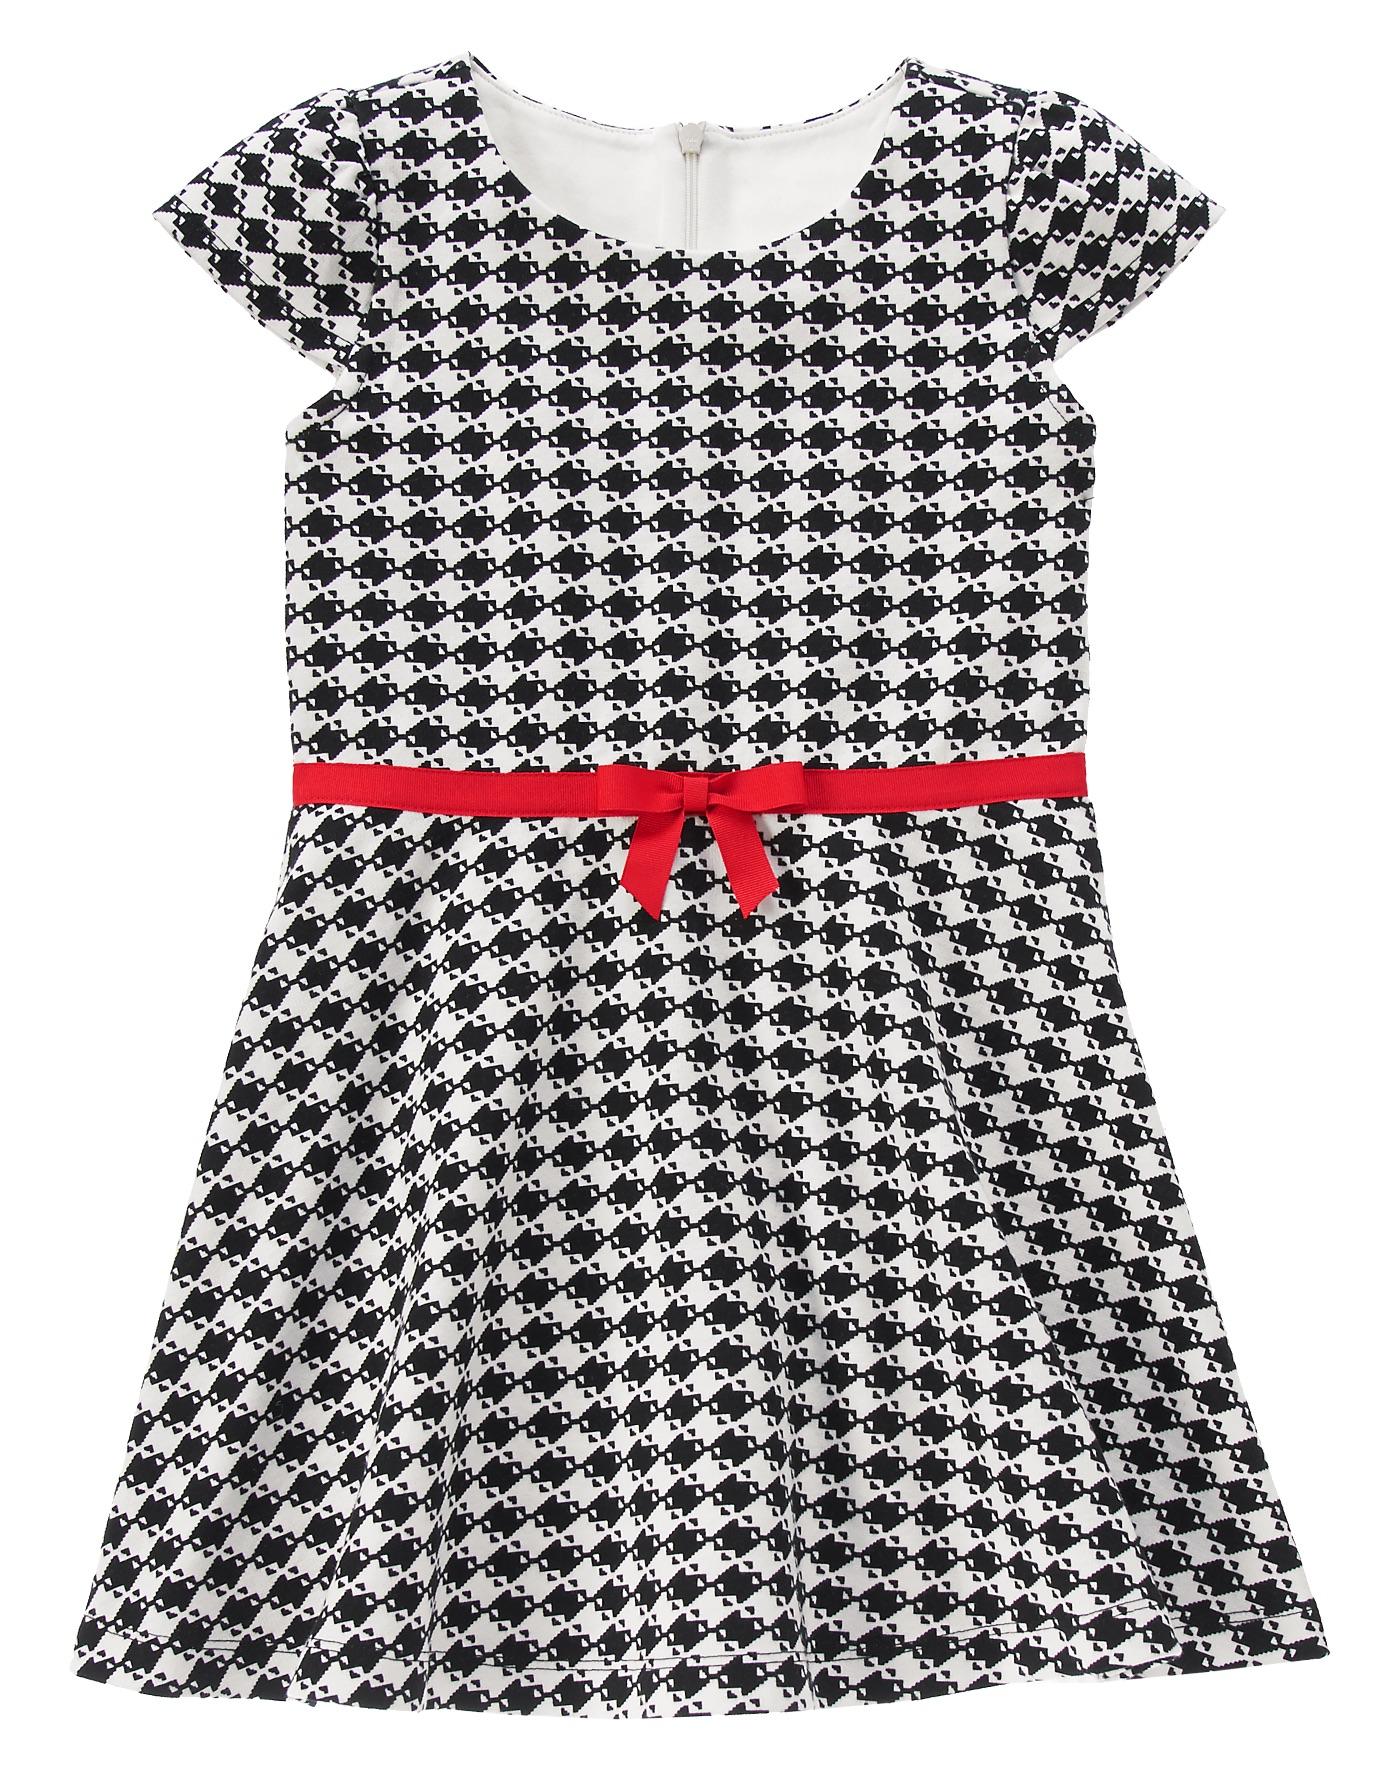 Red Dress w_ Black Bow - $39.95.jpg